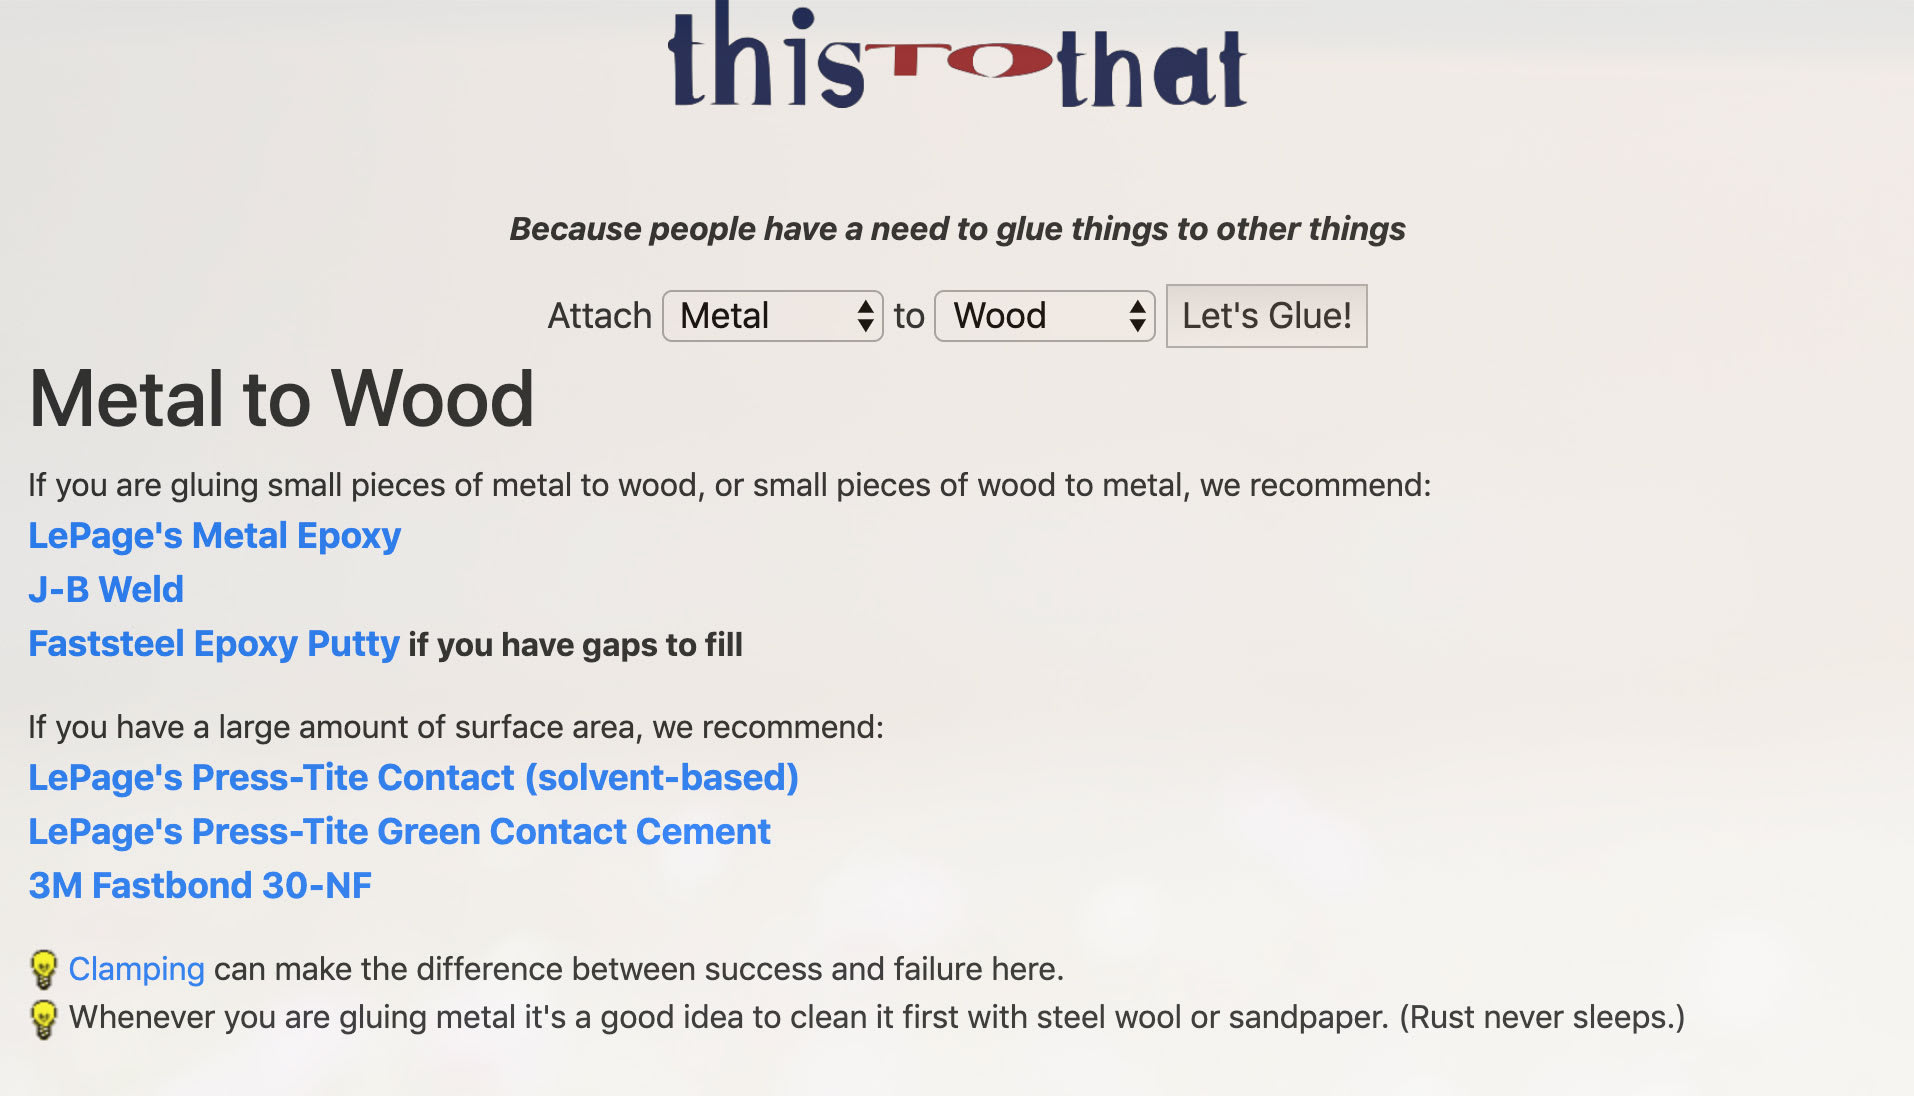 Screenshot of ThisToThat's homepage